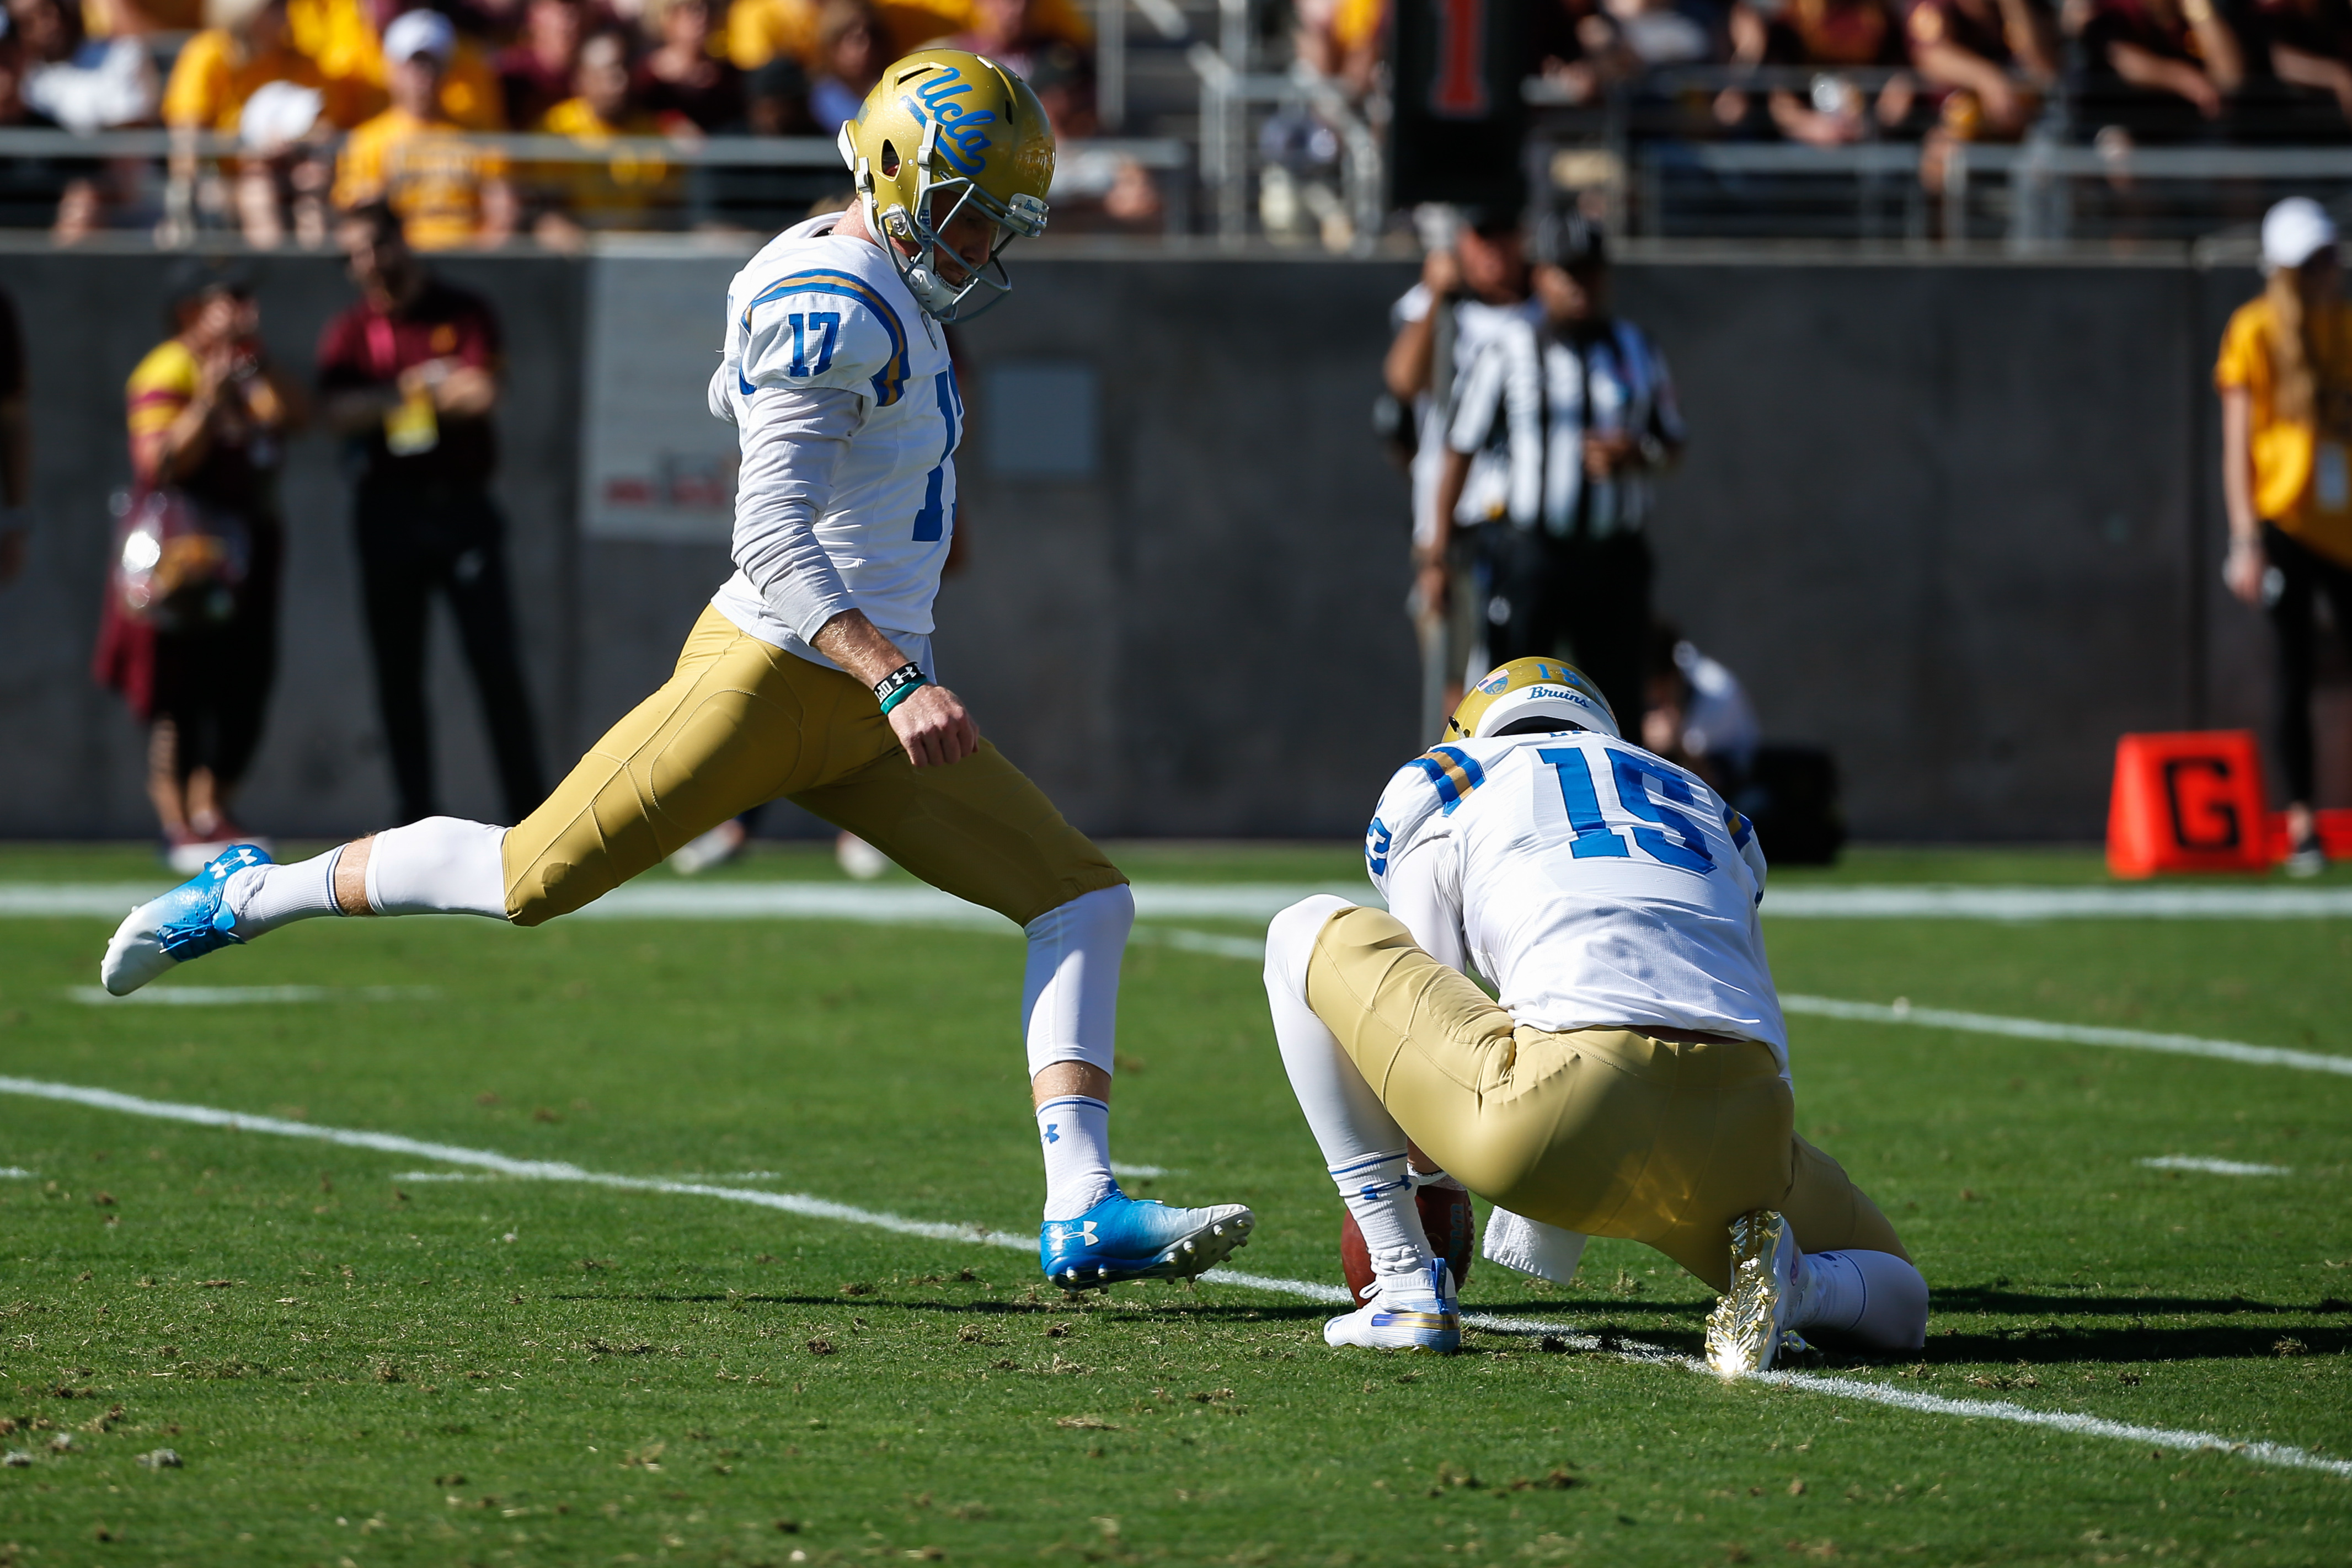 COLLEGE FOOTBALL: NOV 10 UCLA at Arizona State